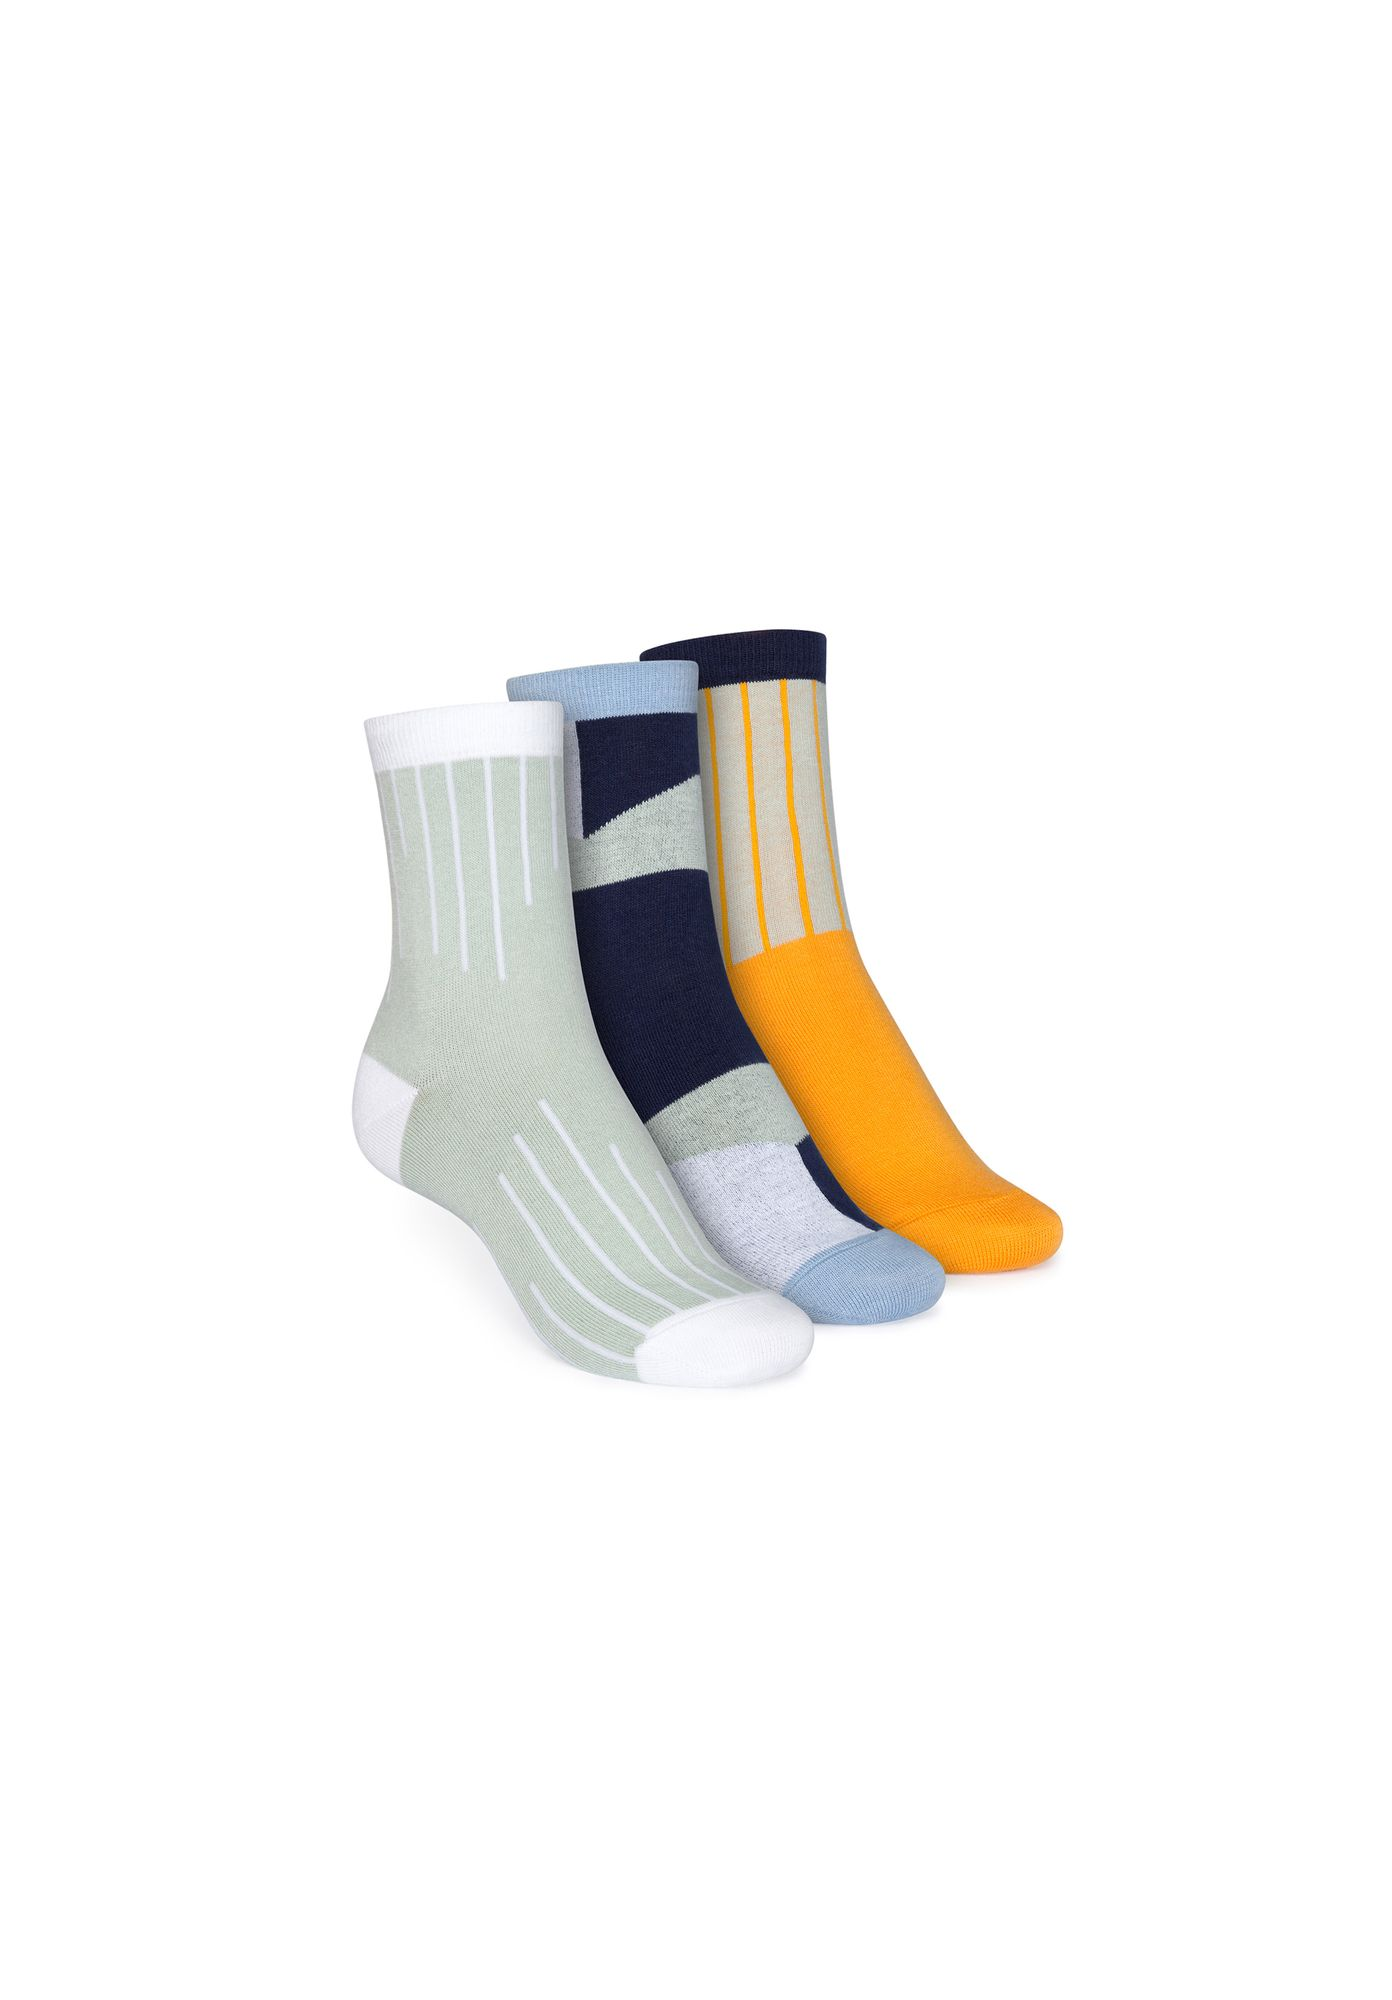 3 Pack Mid-Top Socks Colour Grading/Geometric/Vertical